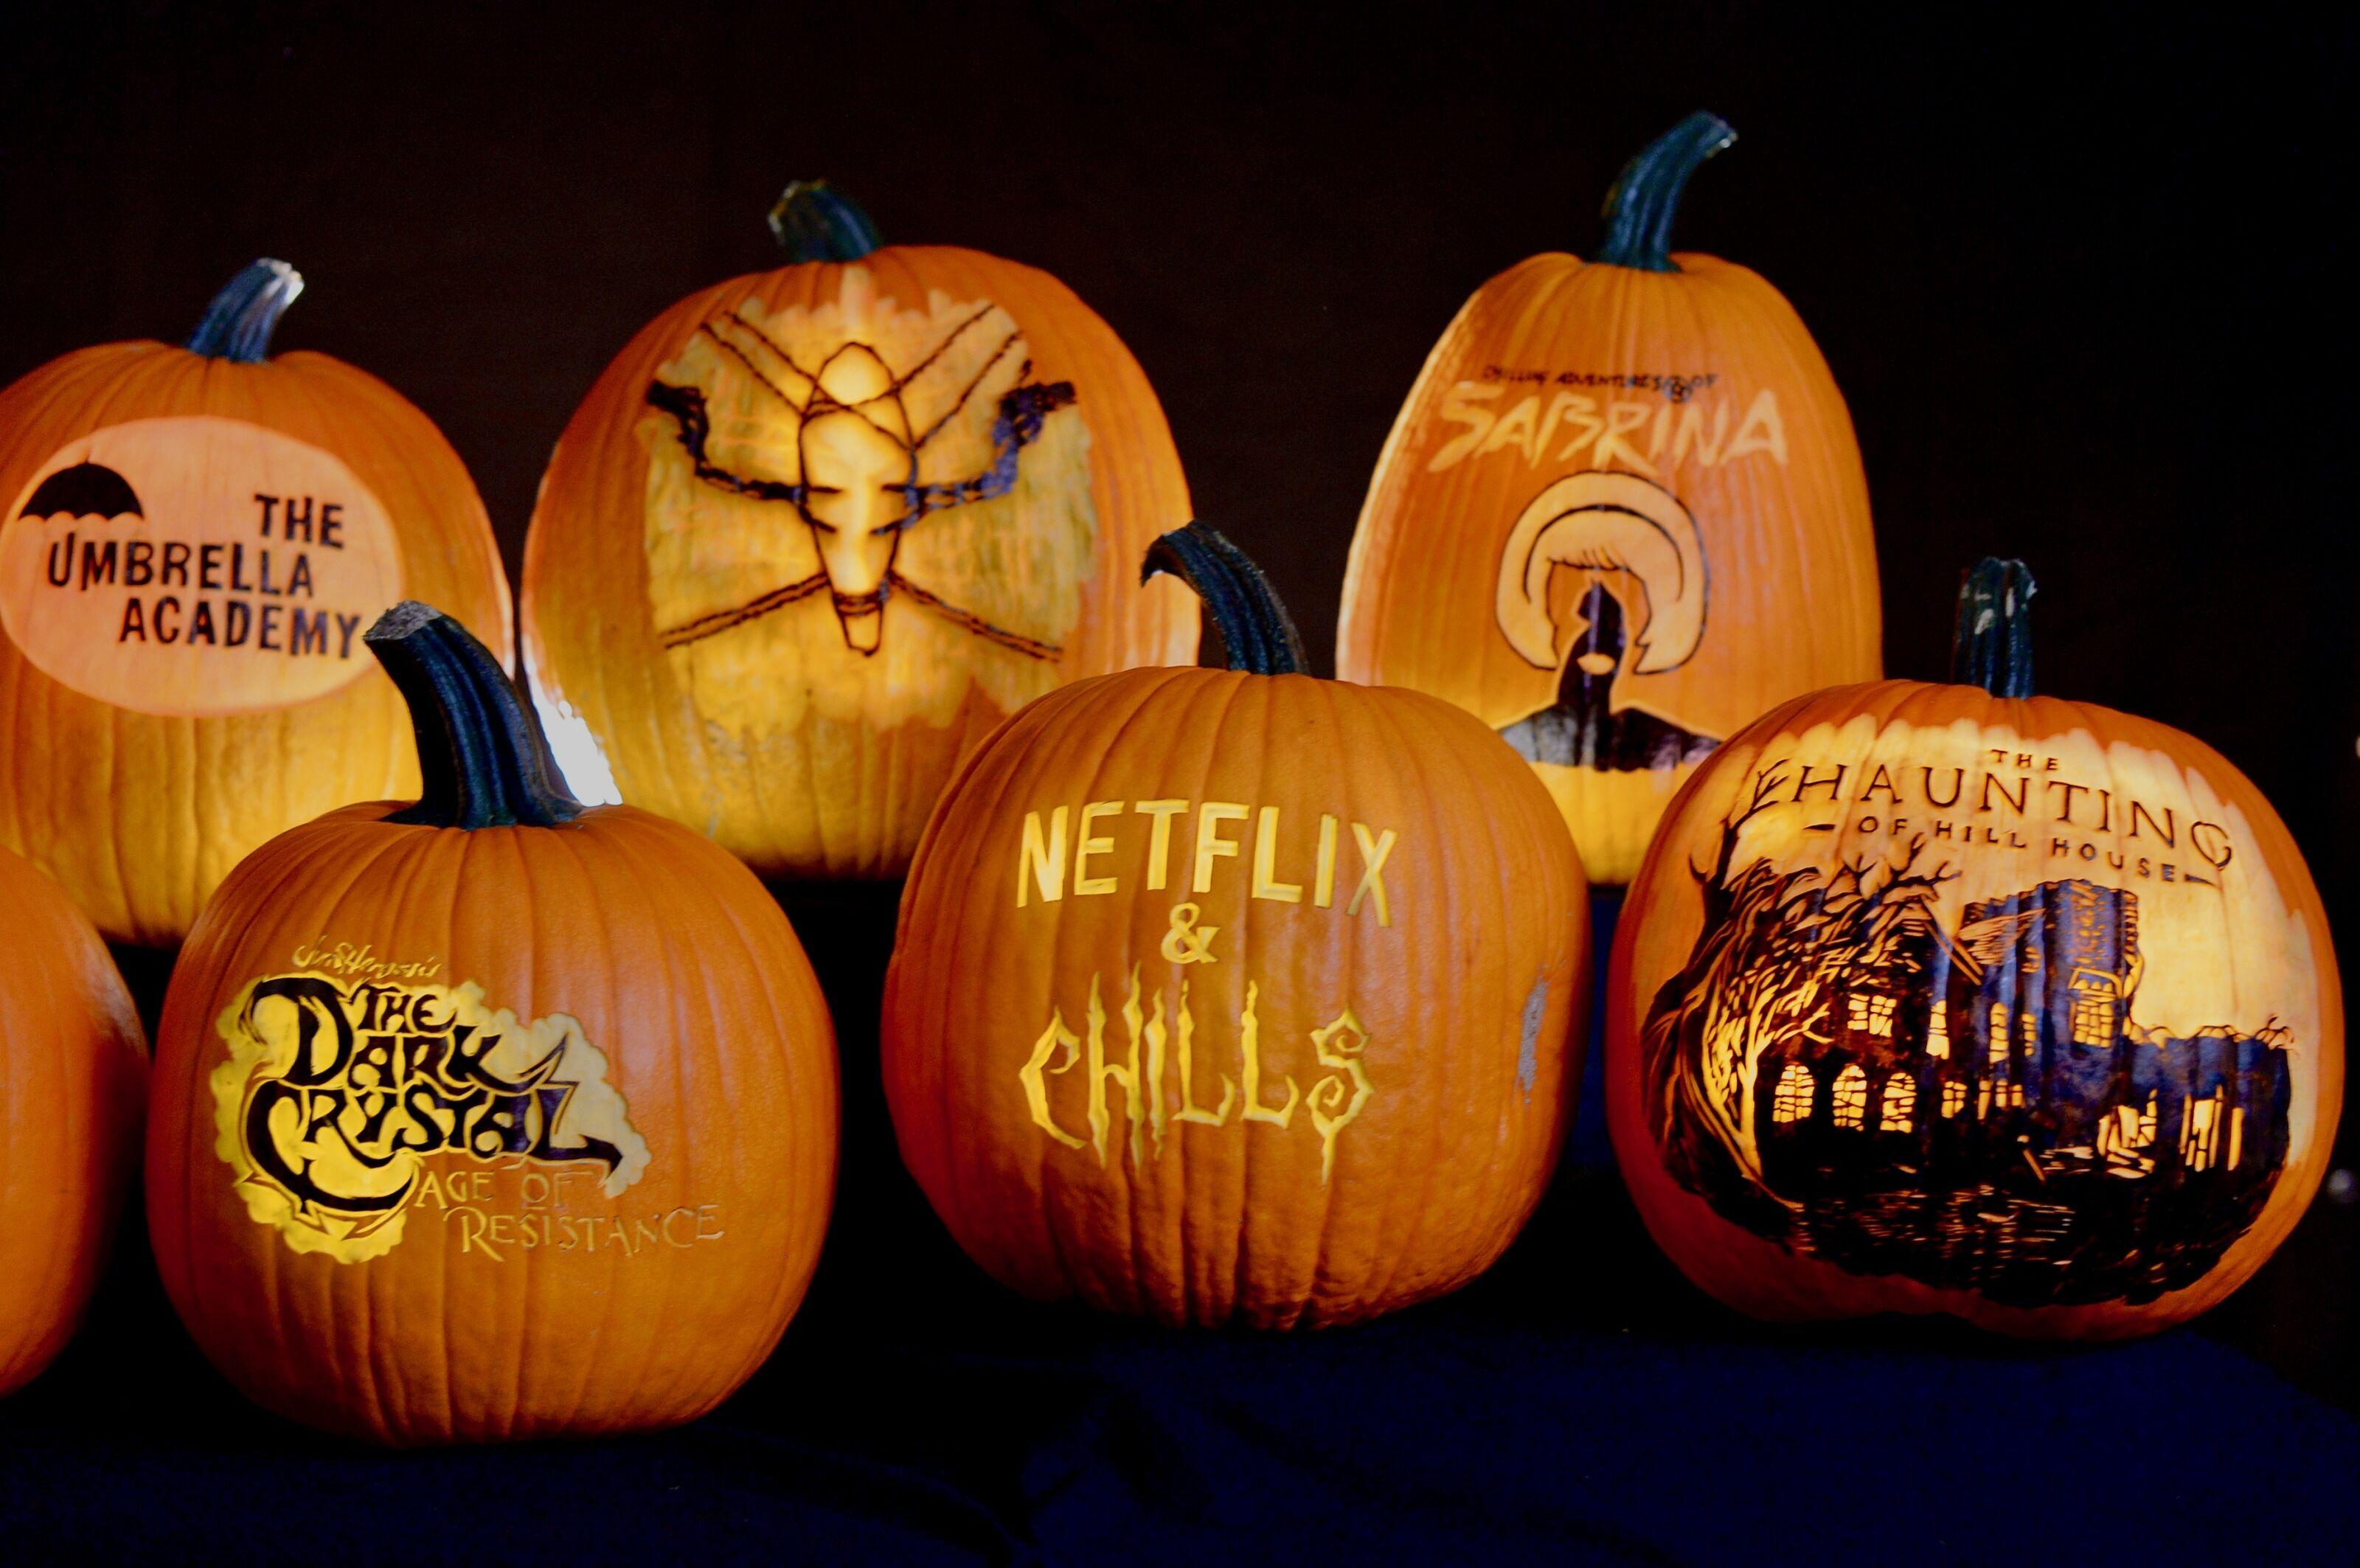 Netflix & Chills is a pre-Halloween treat